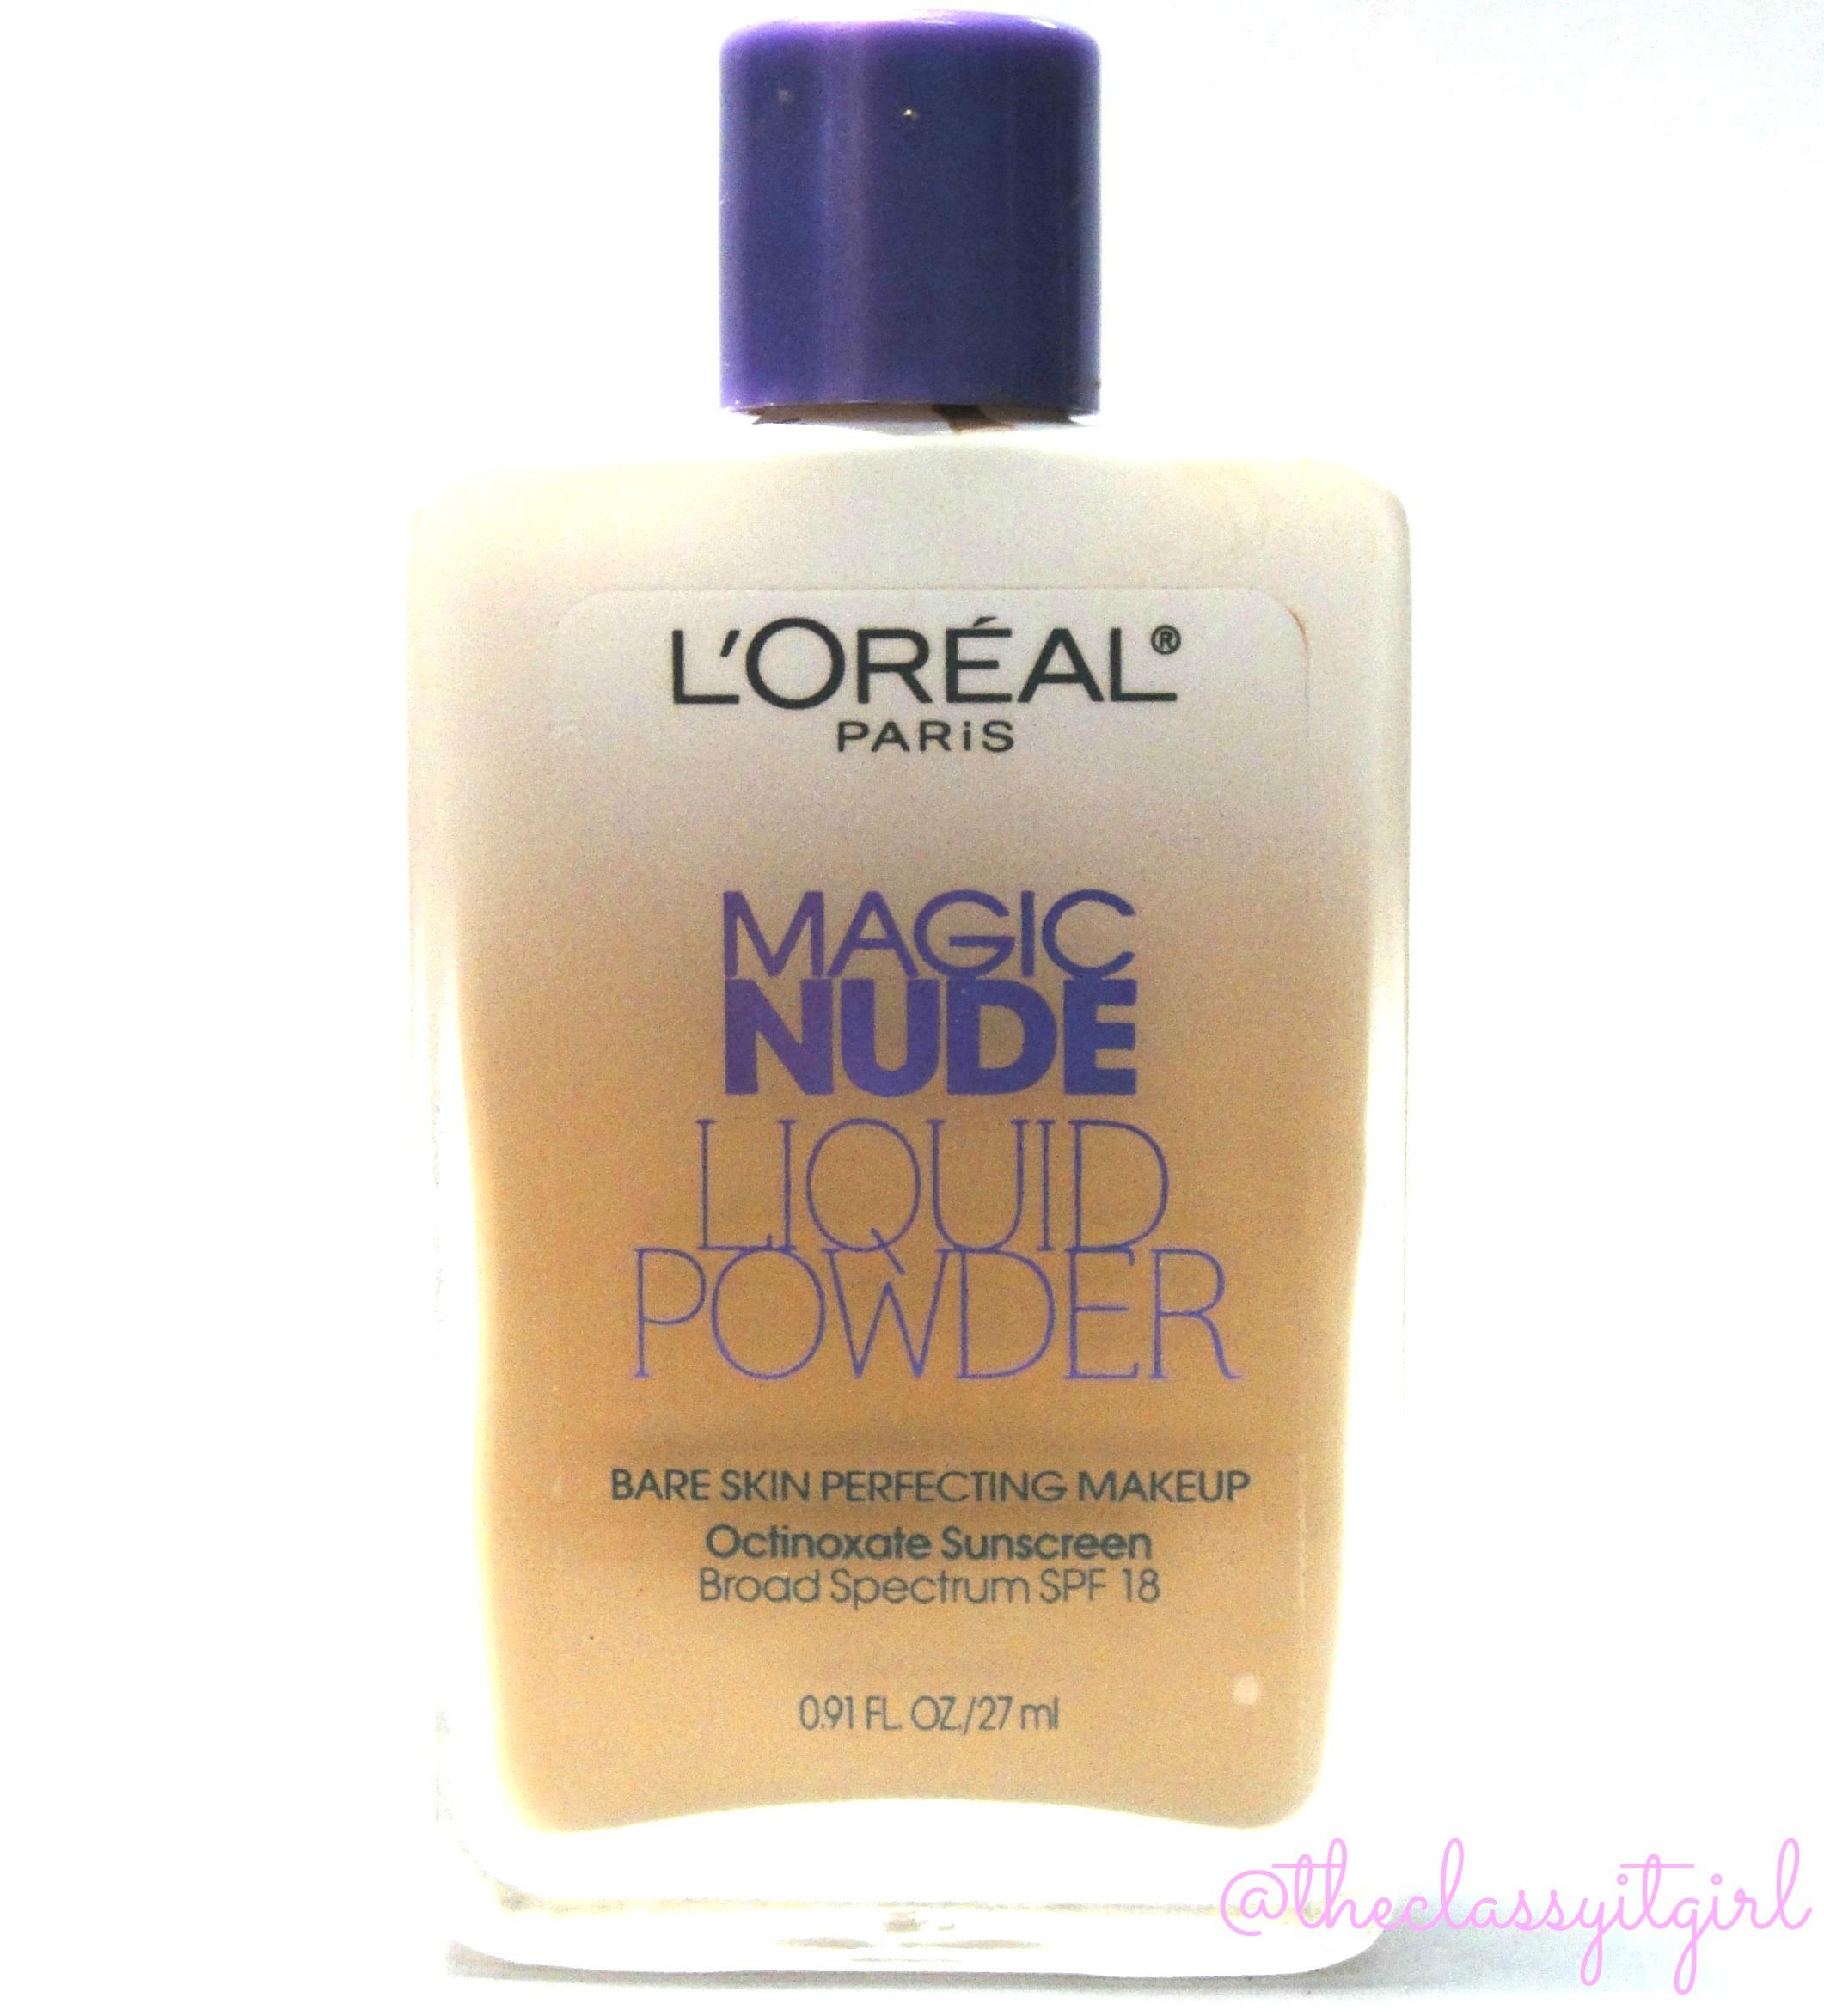 LOreal Magic Nude Liquid Powder Foundation Swatches